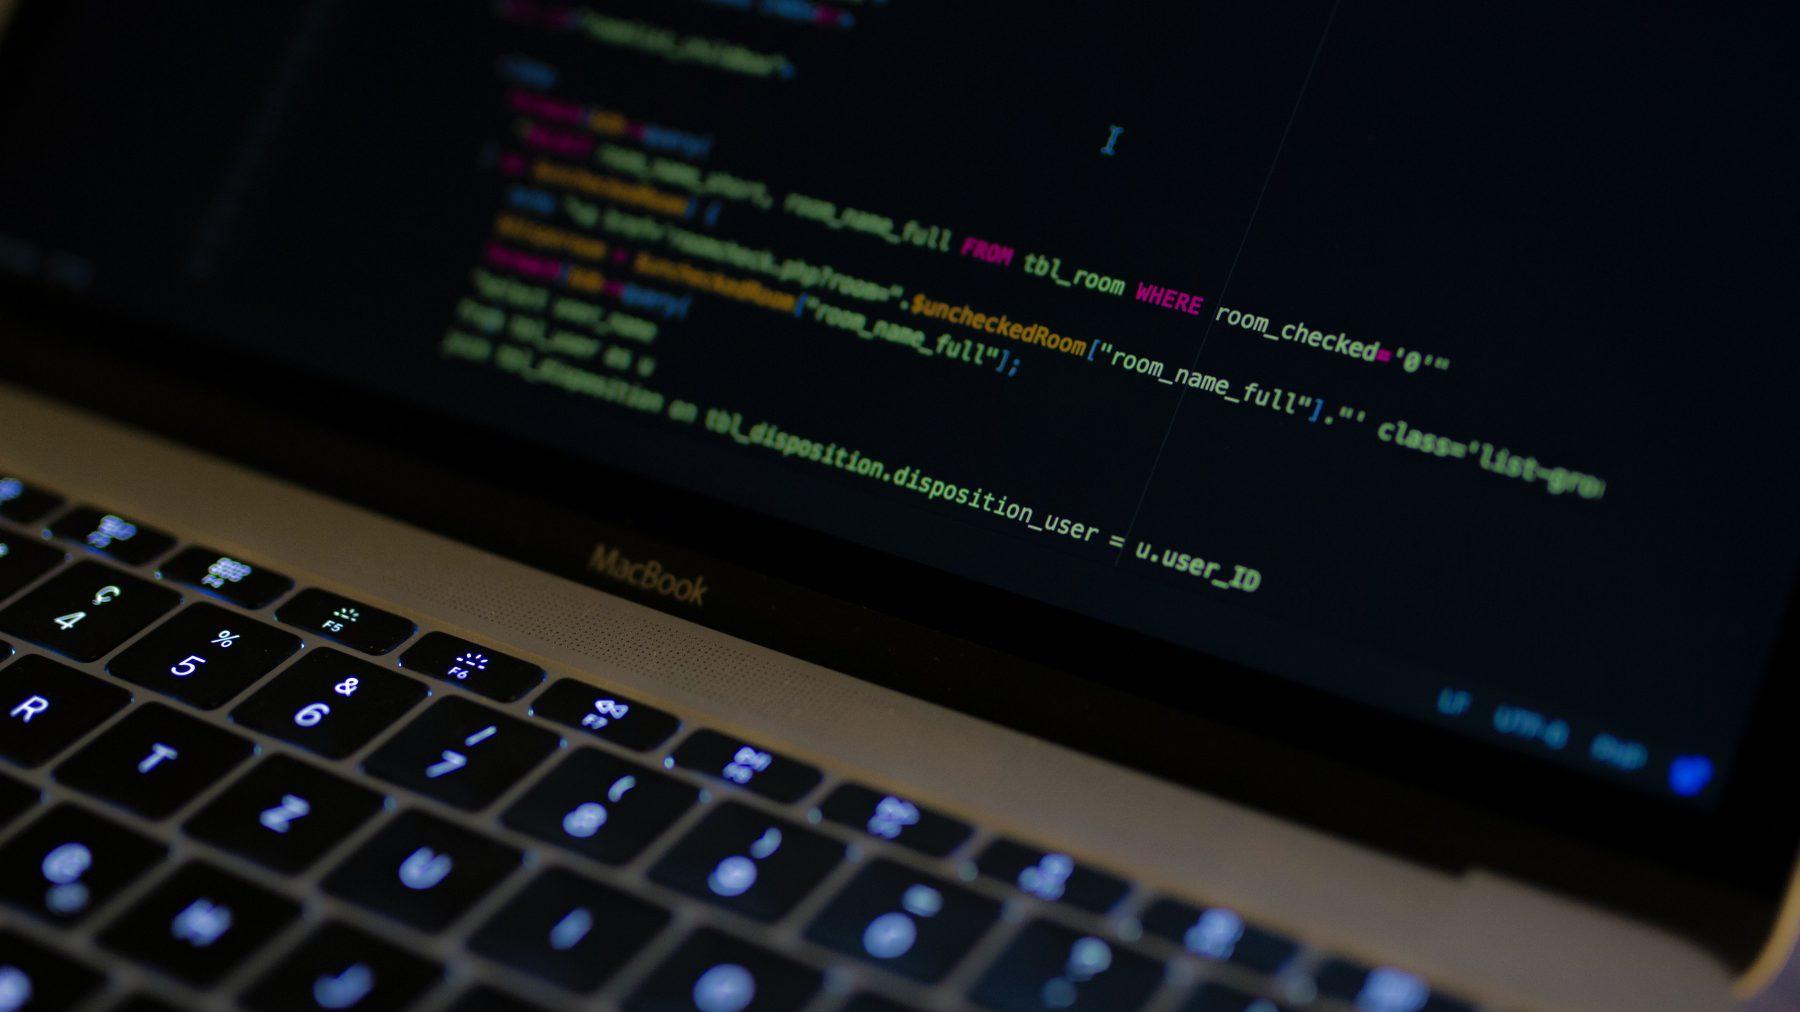 Python / 如何在建立 SQLite 資料庫並在 python 中執行 SQL Script